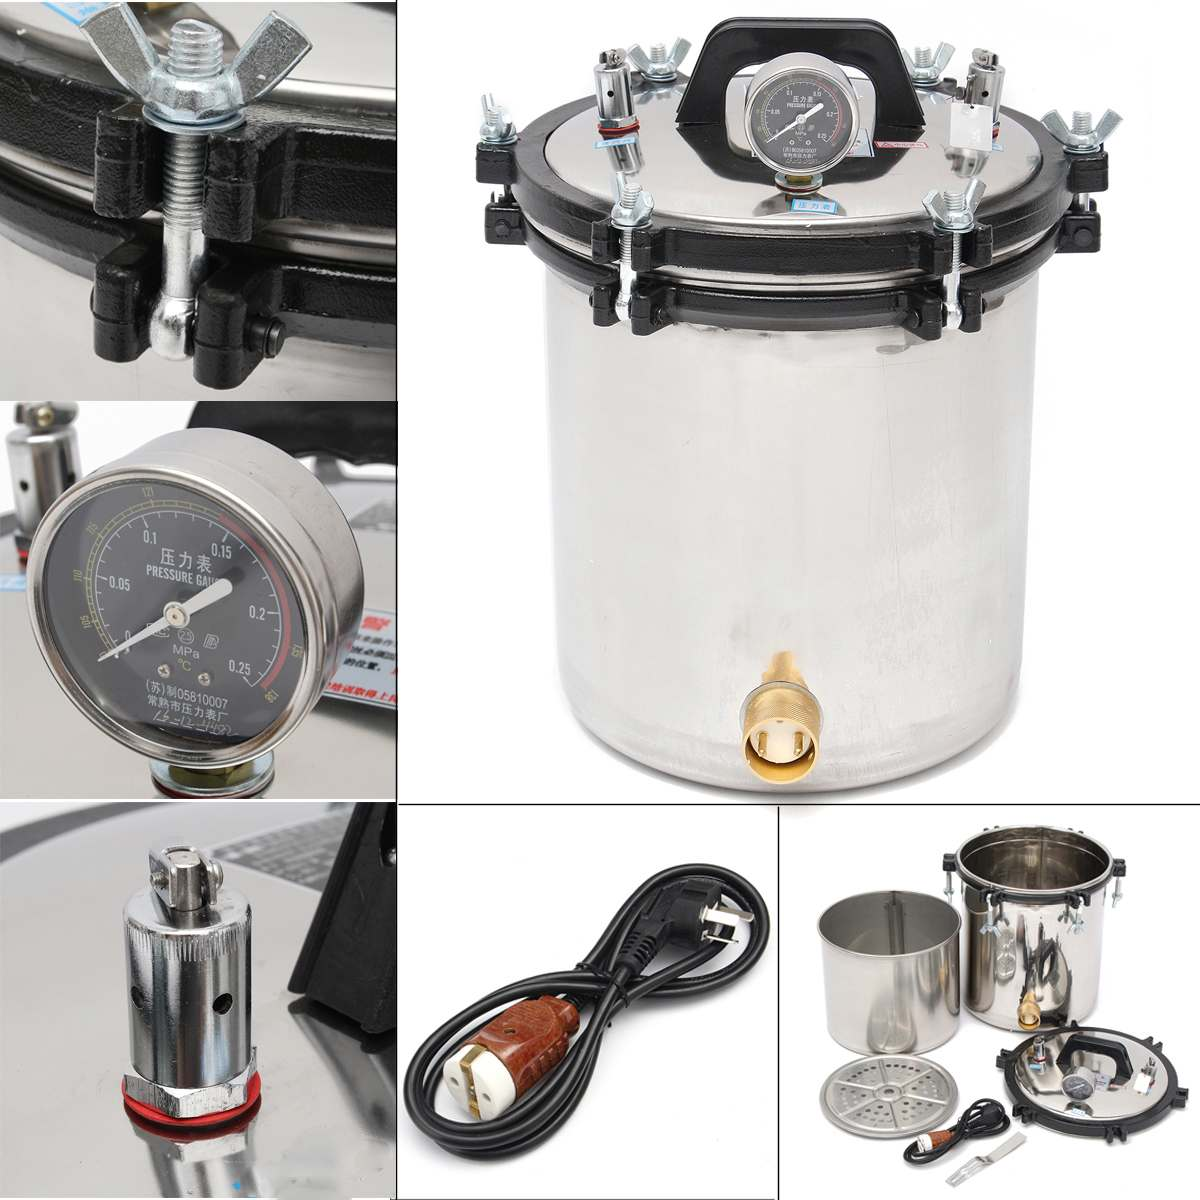 top 10 pressure steam sterilizer manufacturers ideas and get